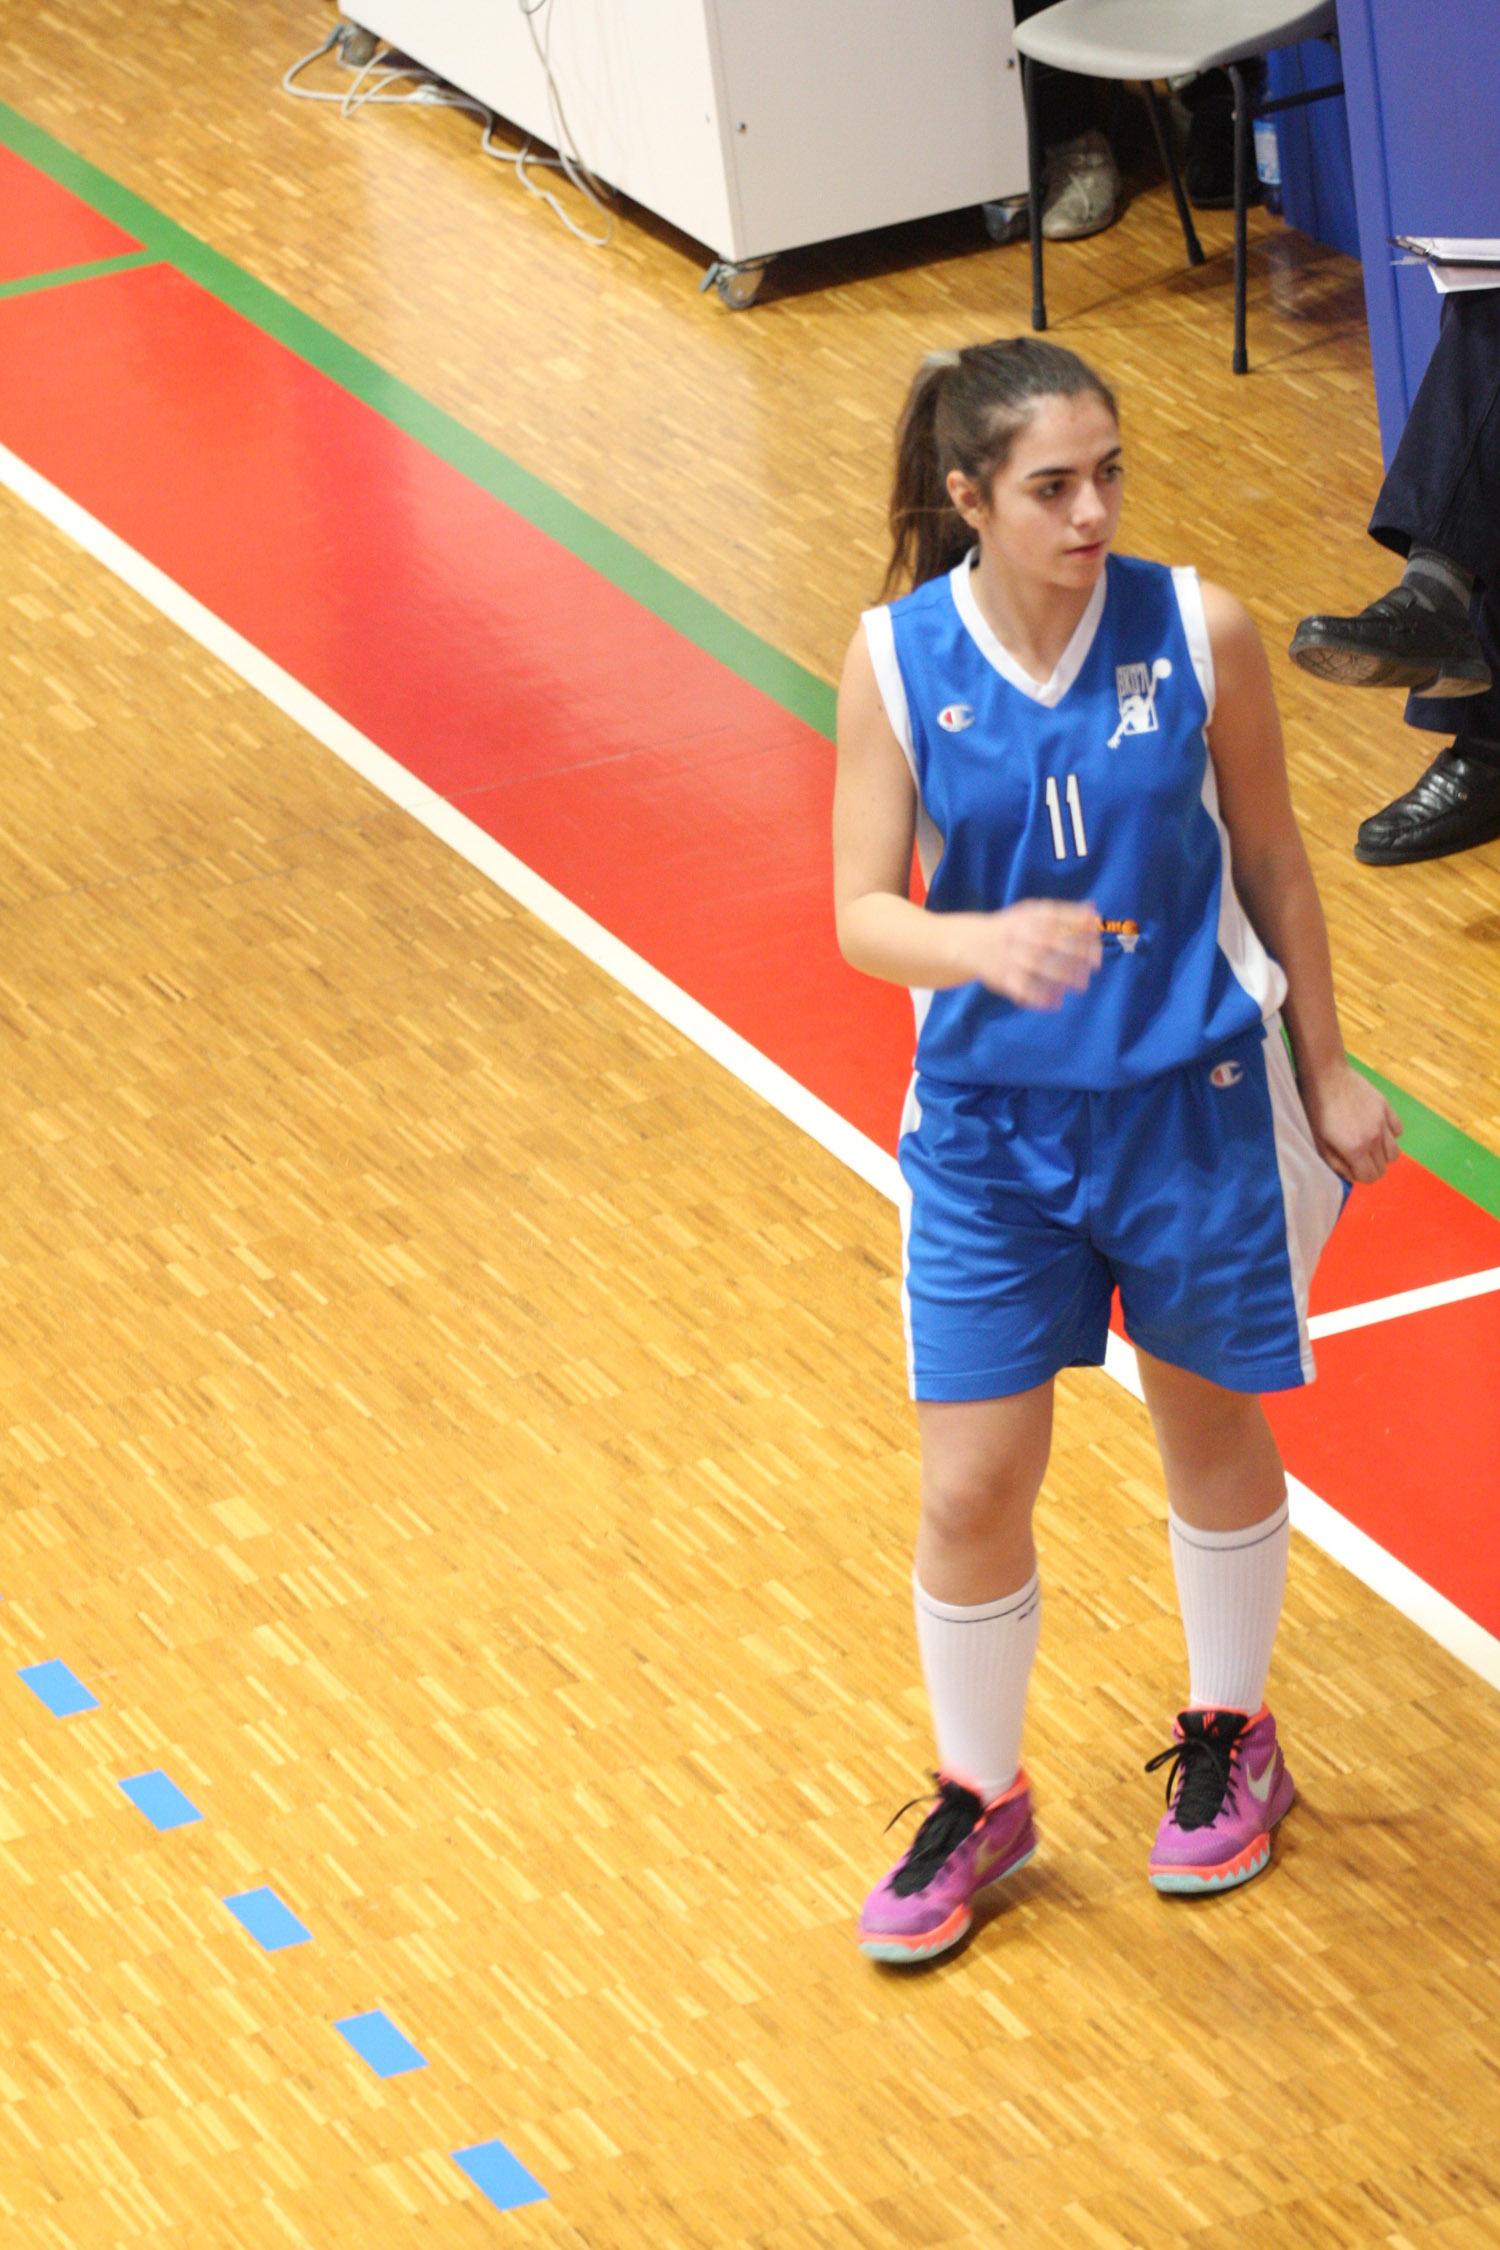 U16E - Costa Masnaga vs Baskettiamo Vittuone 2001 00034.jpg